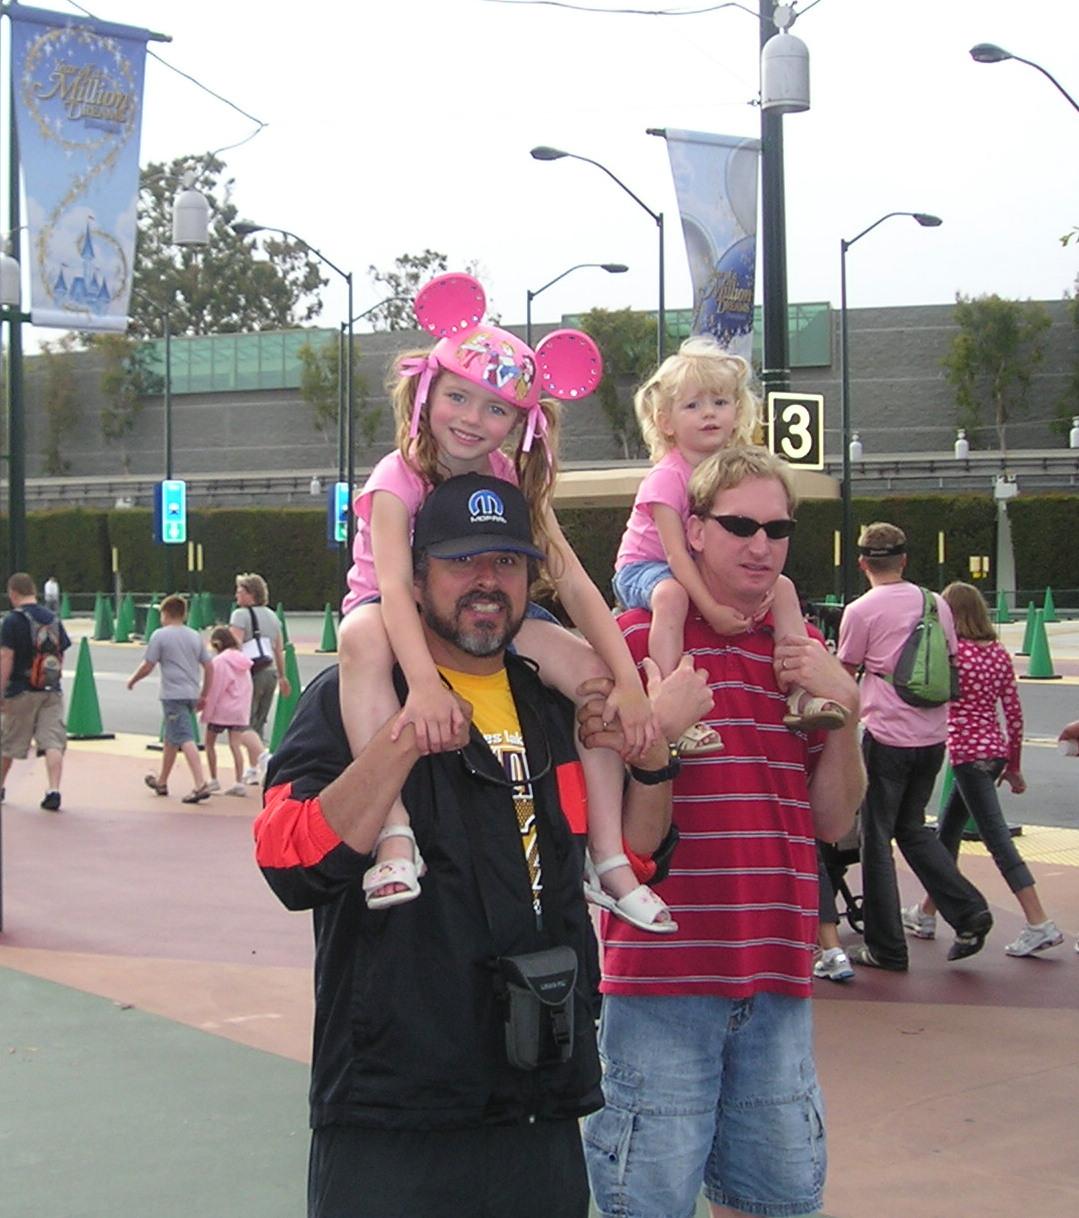 [girls+on+dad]